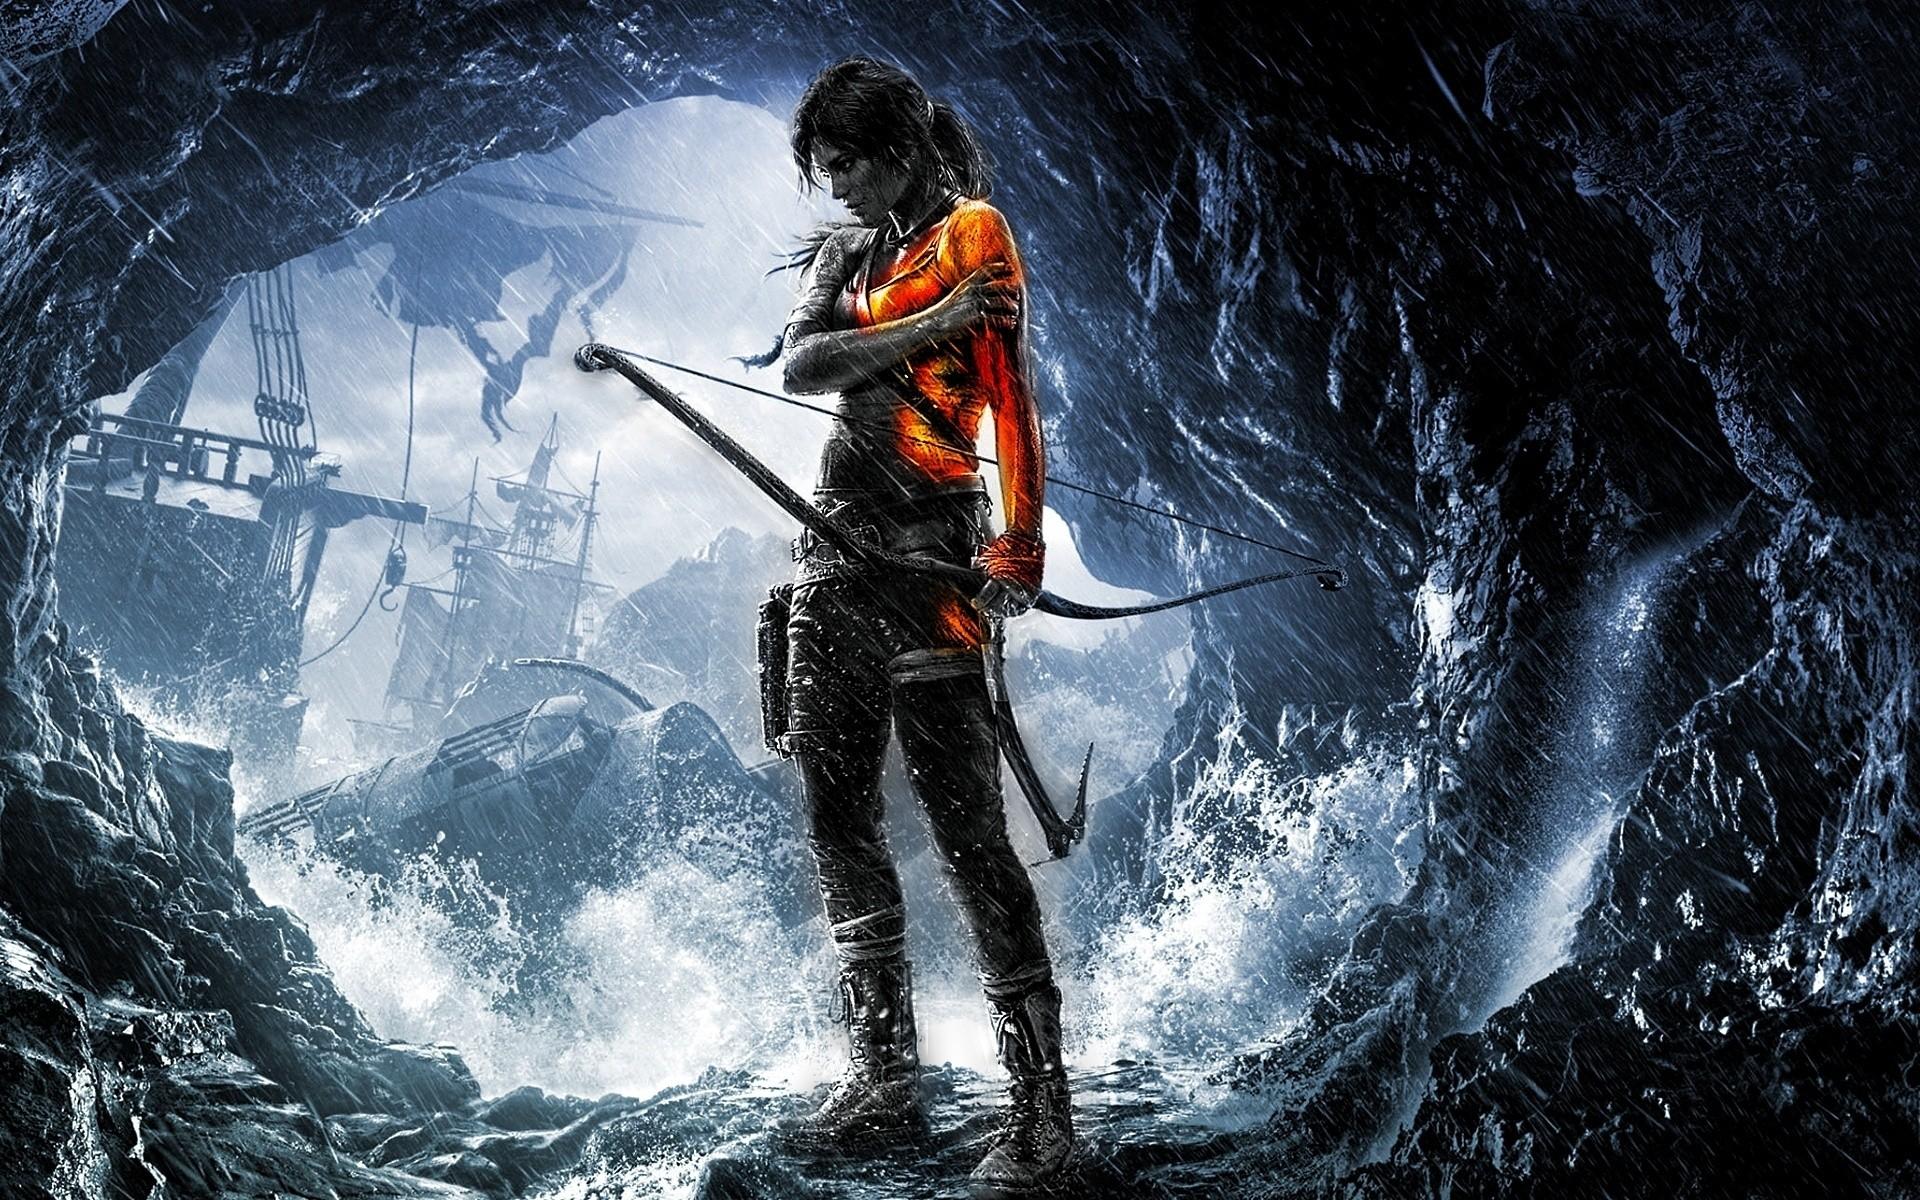 Wallpaper - Lara Croft Tomb Raider Gamer , HD Wallpaper & Backgrounds